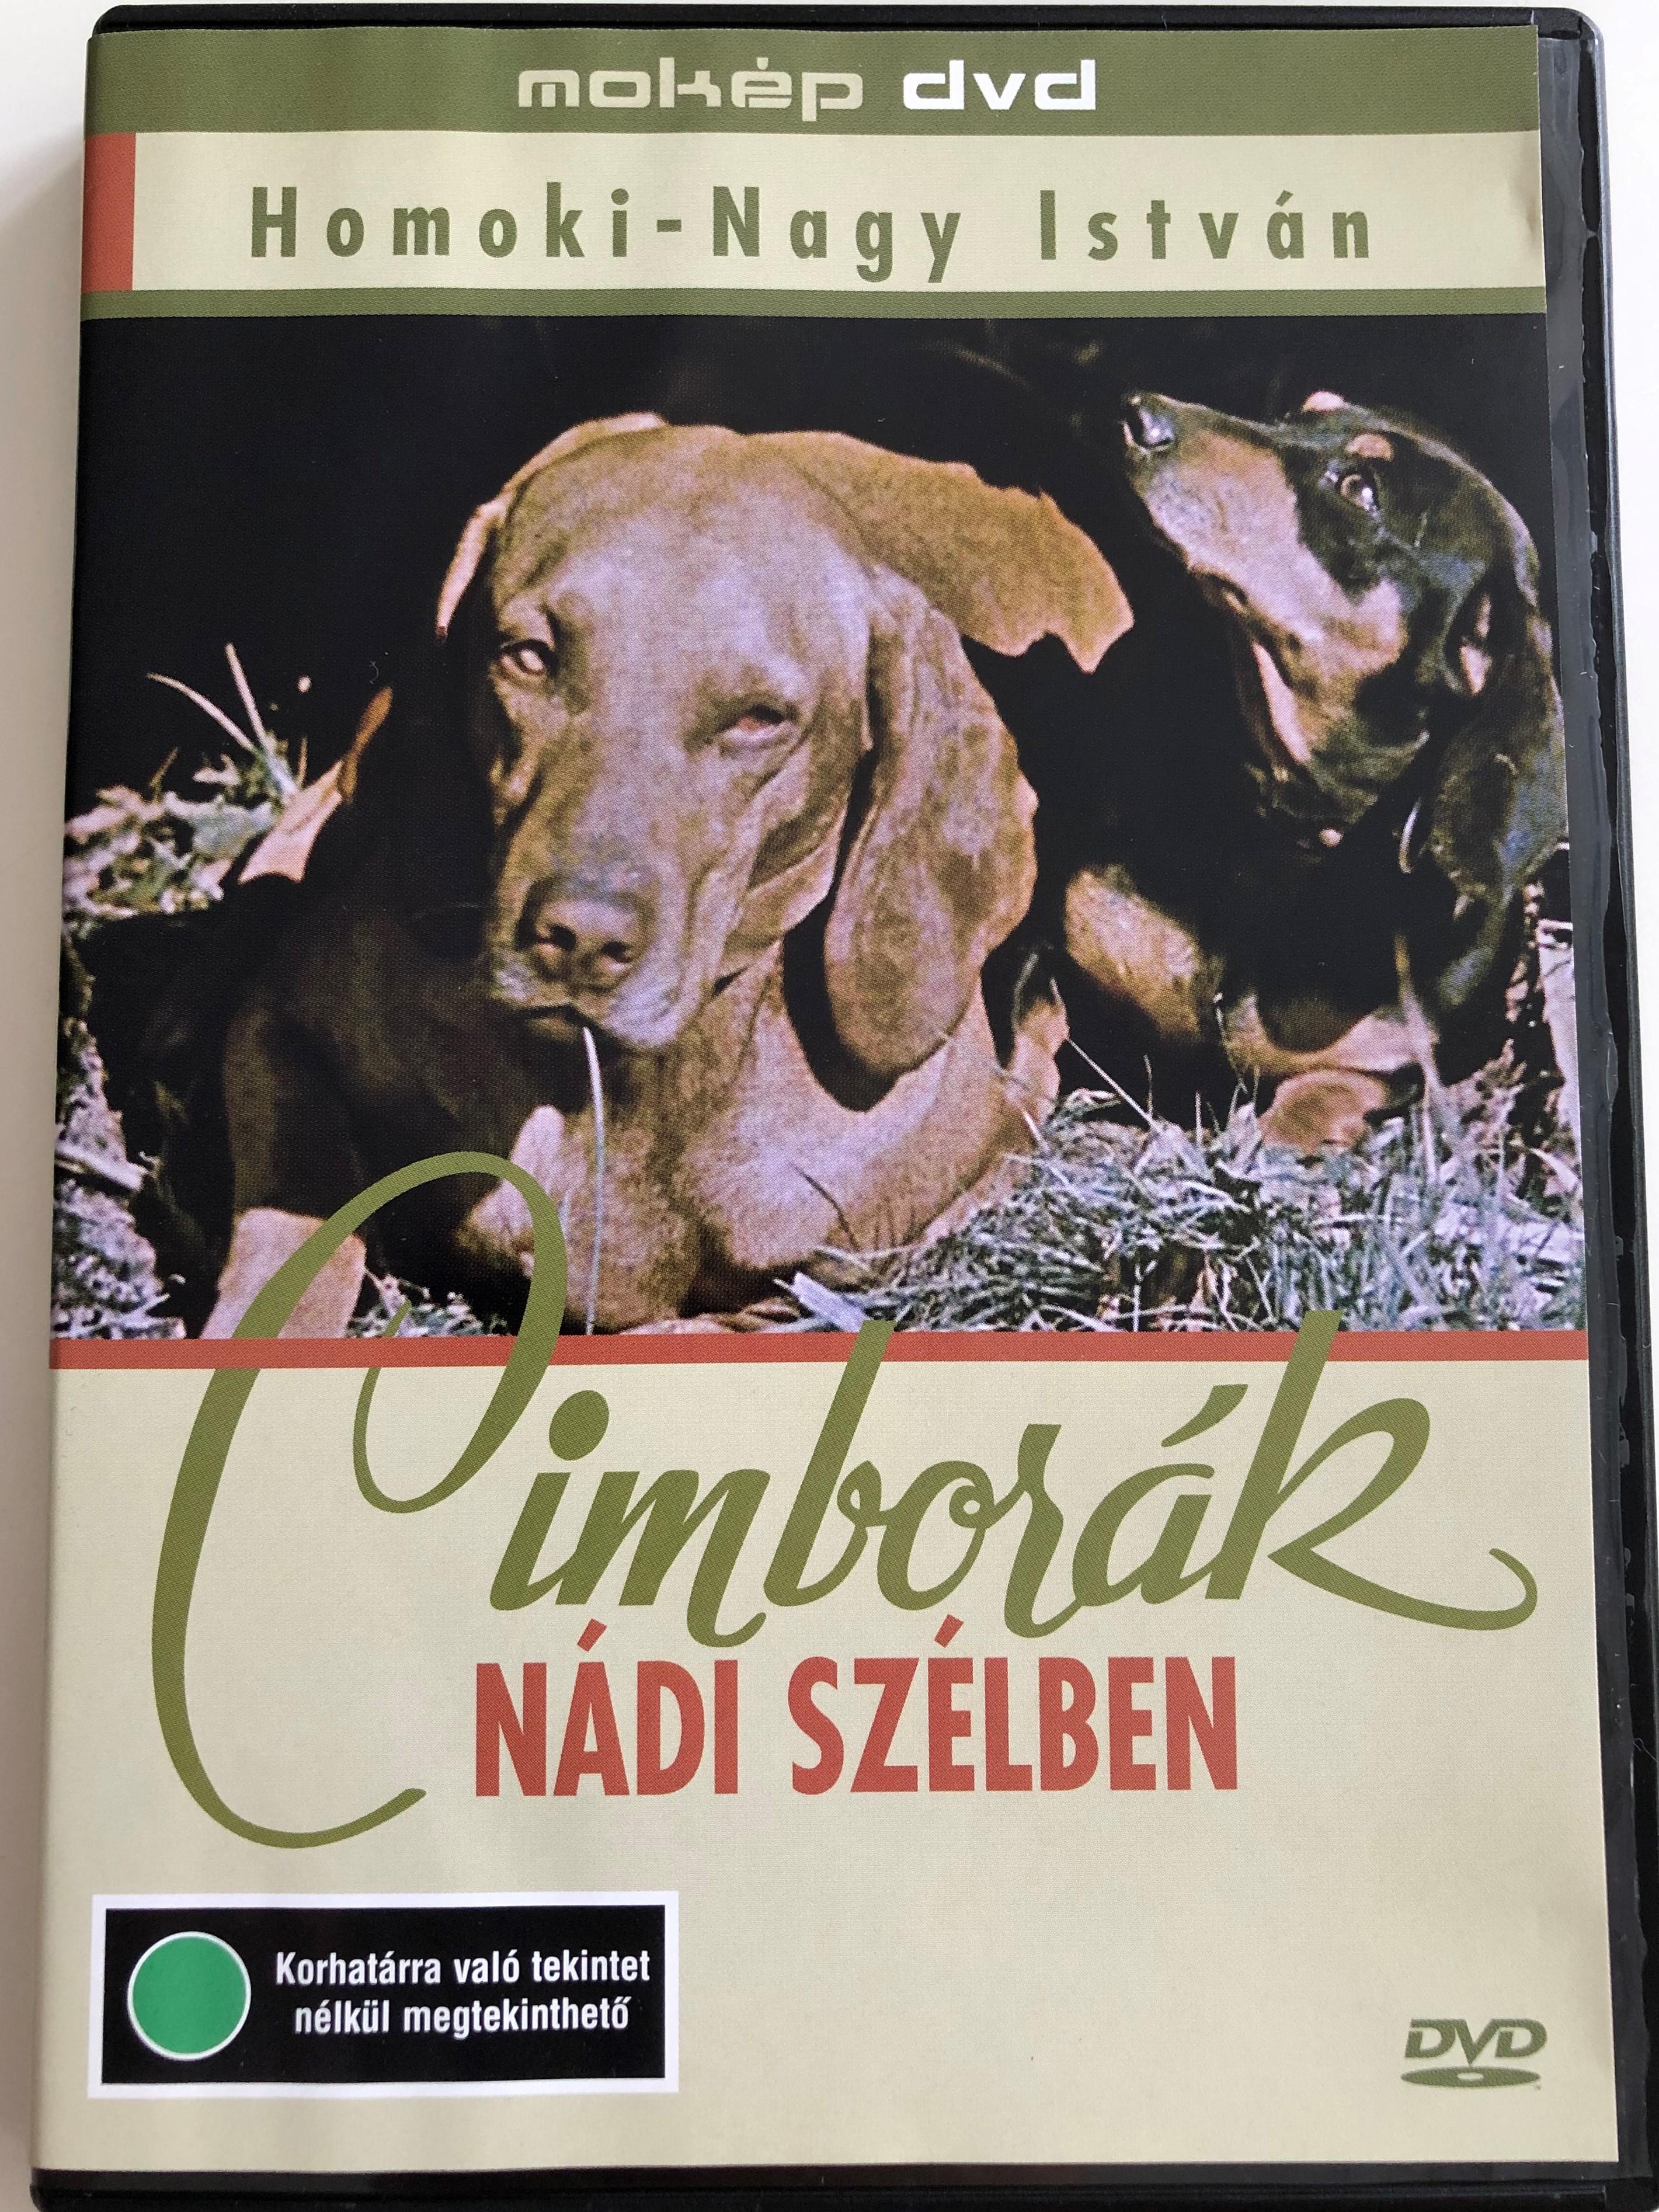 cimbor-k-n-di-sz-lben-dvd-1958-directed-by-istv-n-homoki-nagy-hungarian-nature-documentary-m-k-p-092-1-.jpg